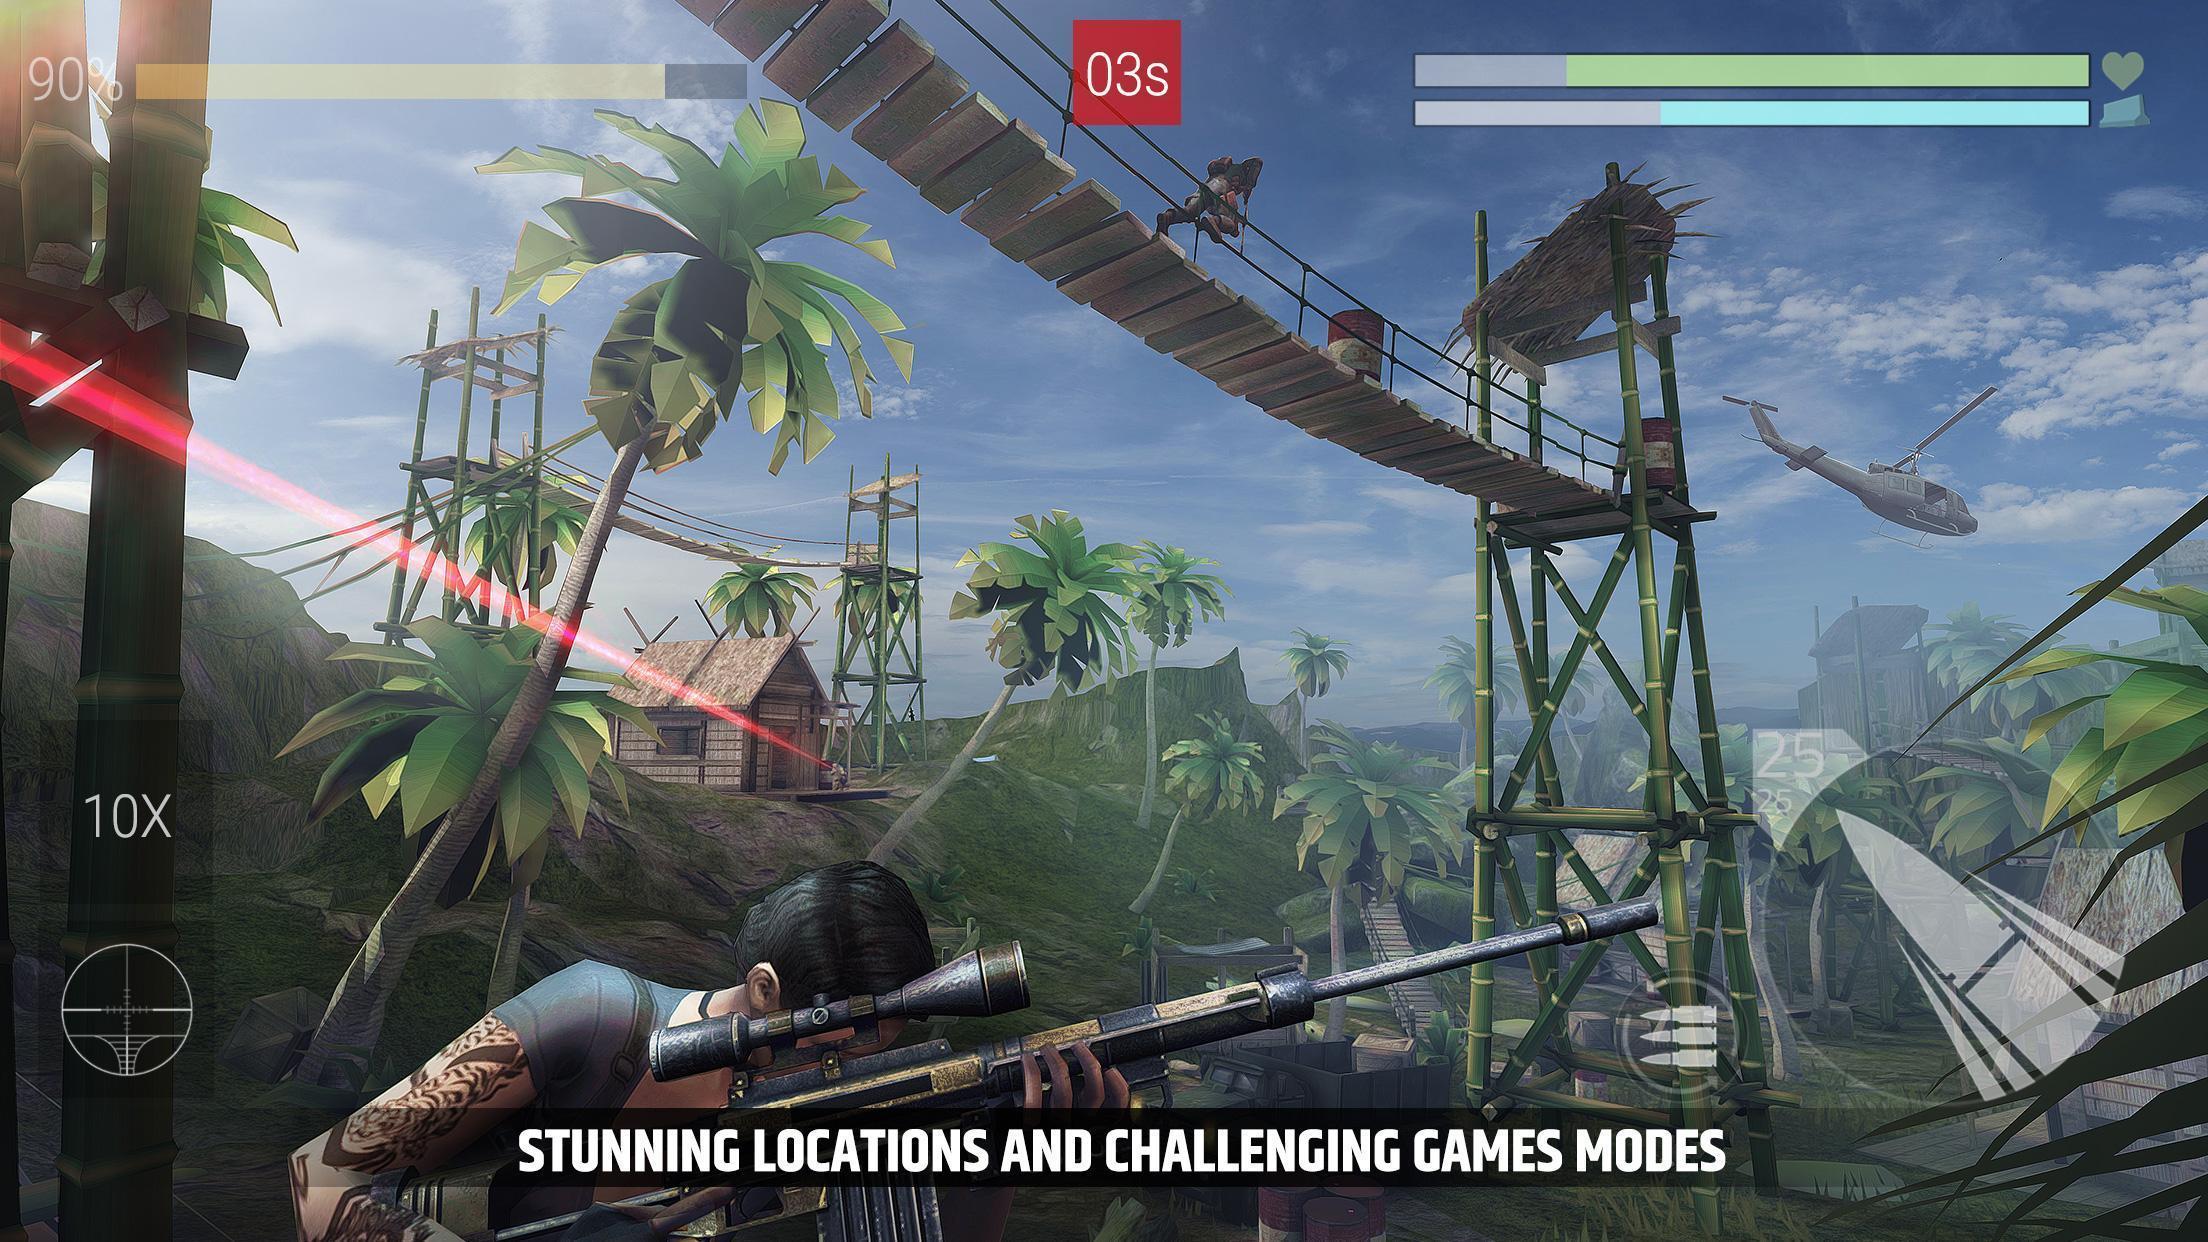 Cover Fire Offline Shooting Games 1.21.1 Screenshot 15